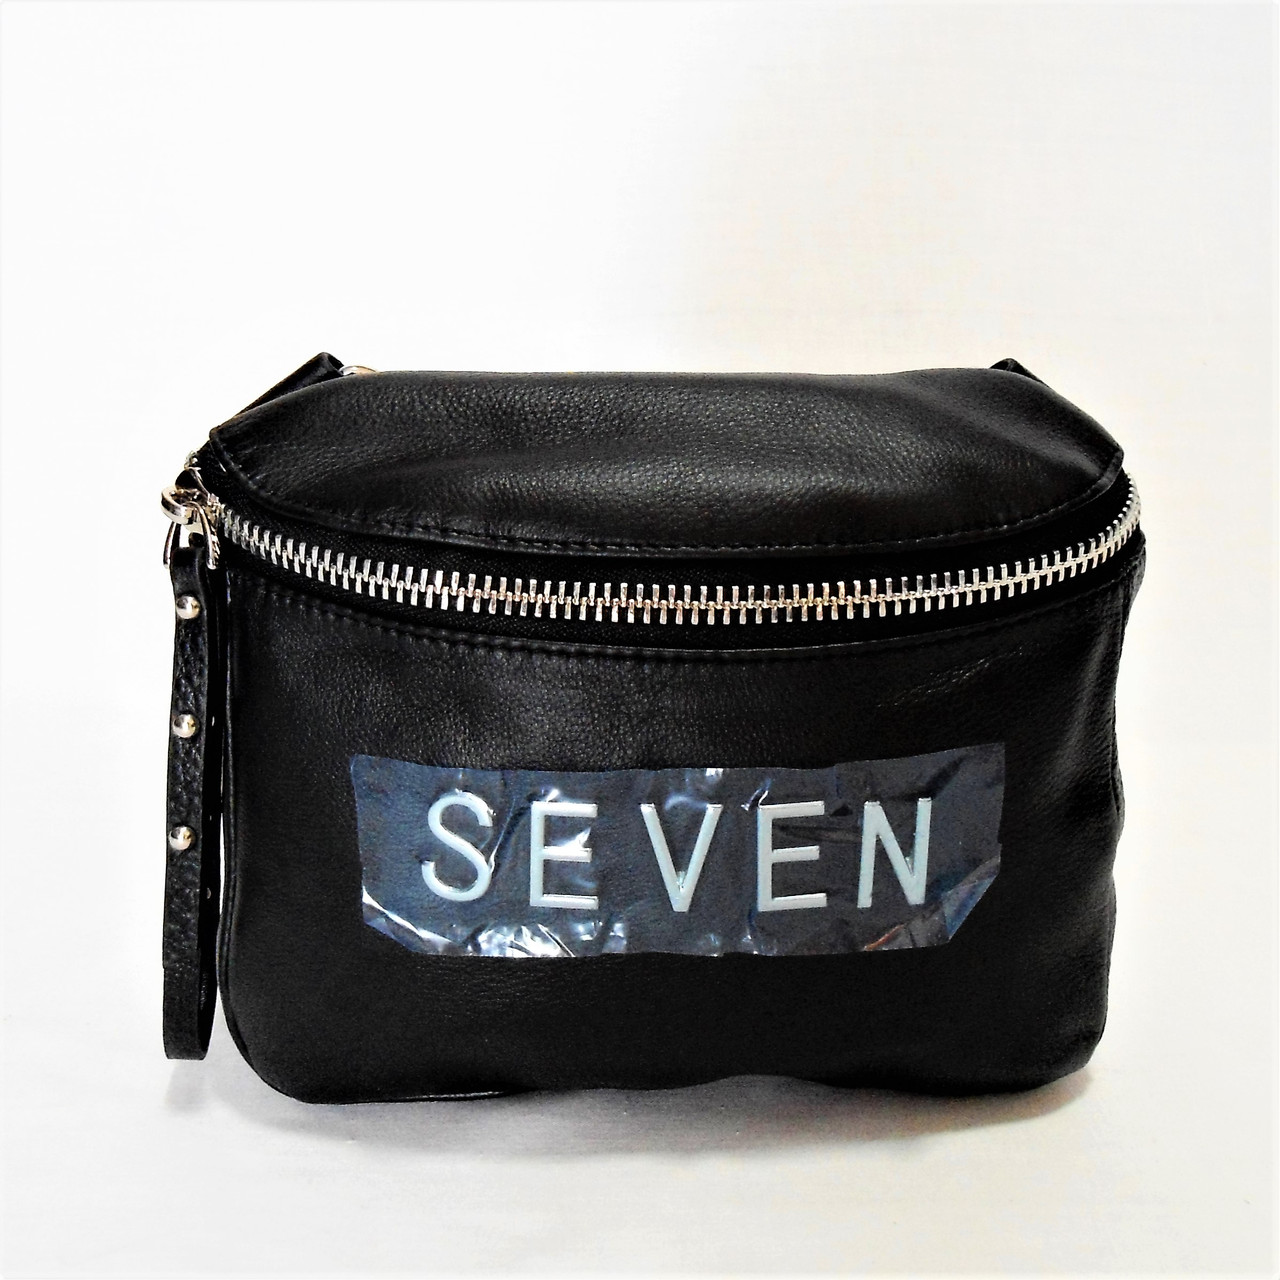 32a41a8f2083 Превосходная женская кожаная сумочка на пояс DСN-053603 Италия ...